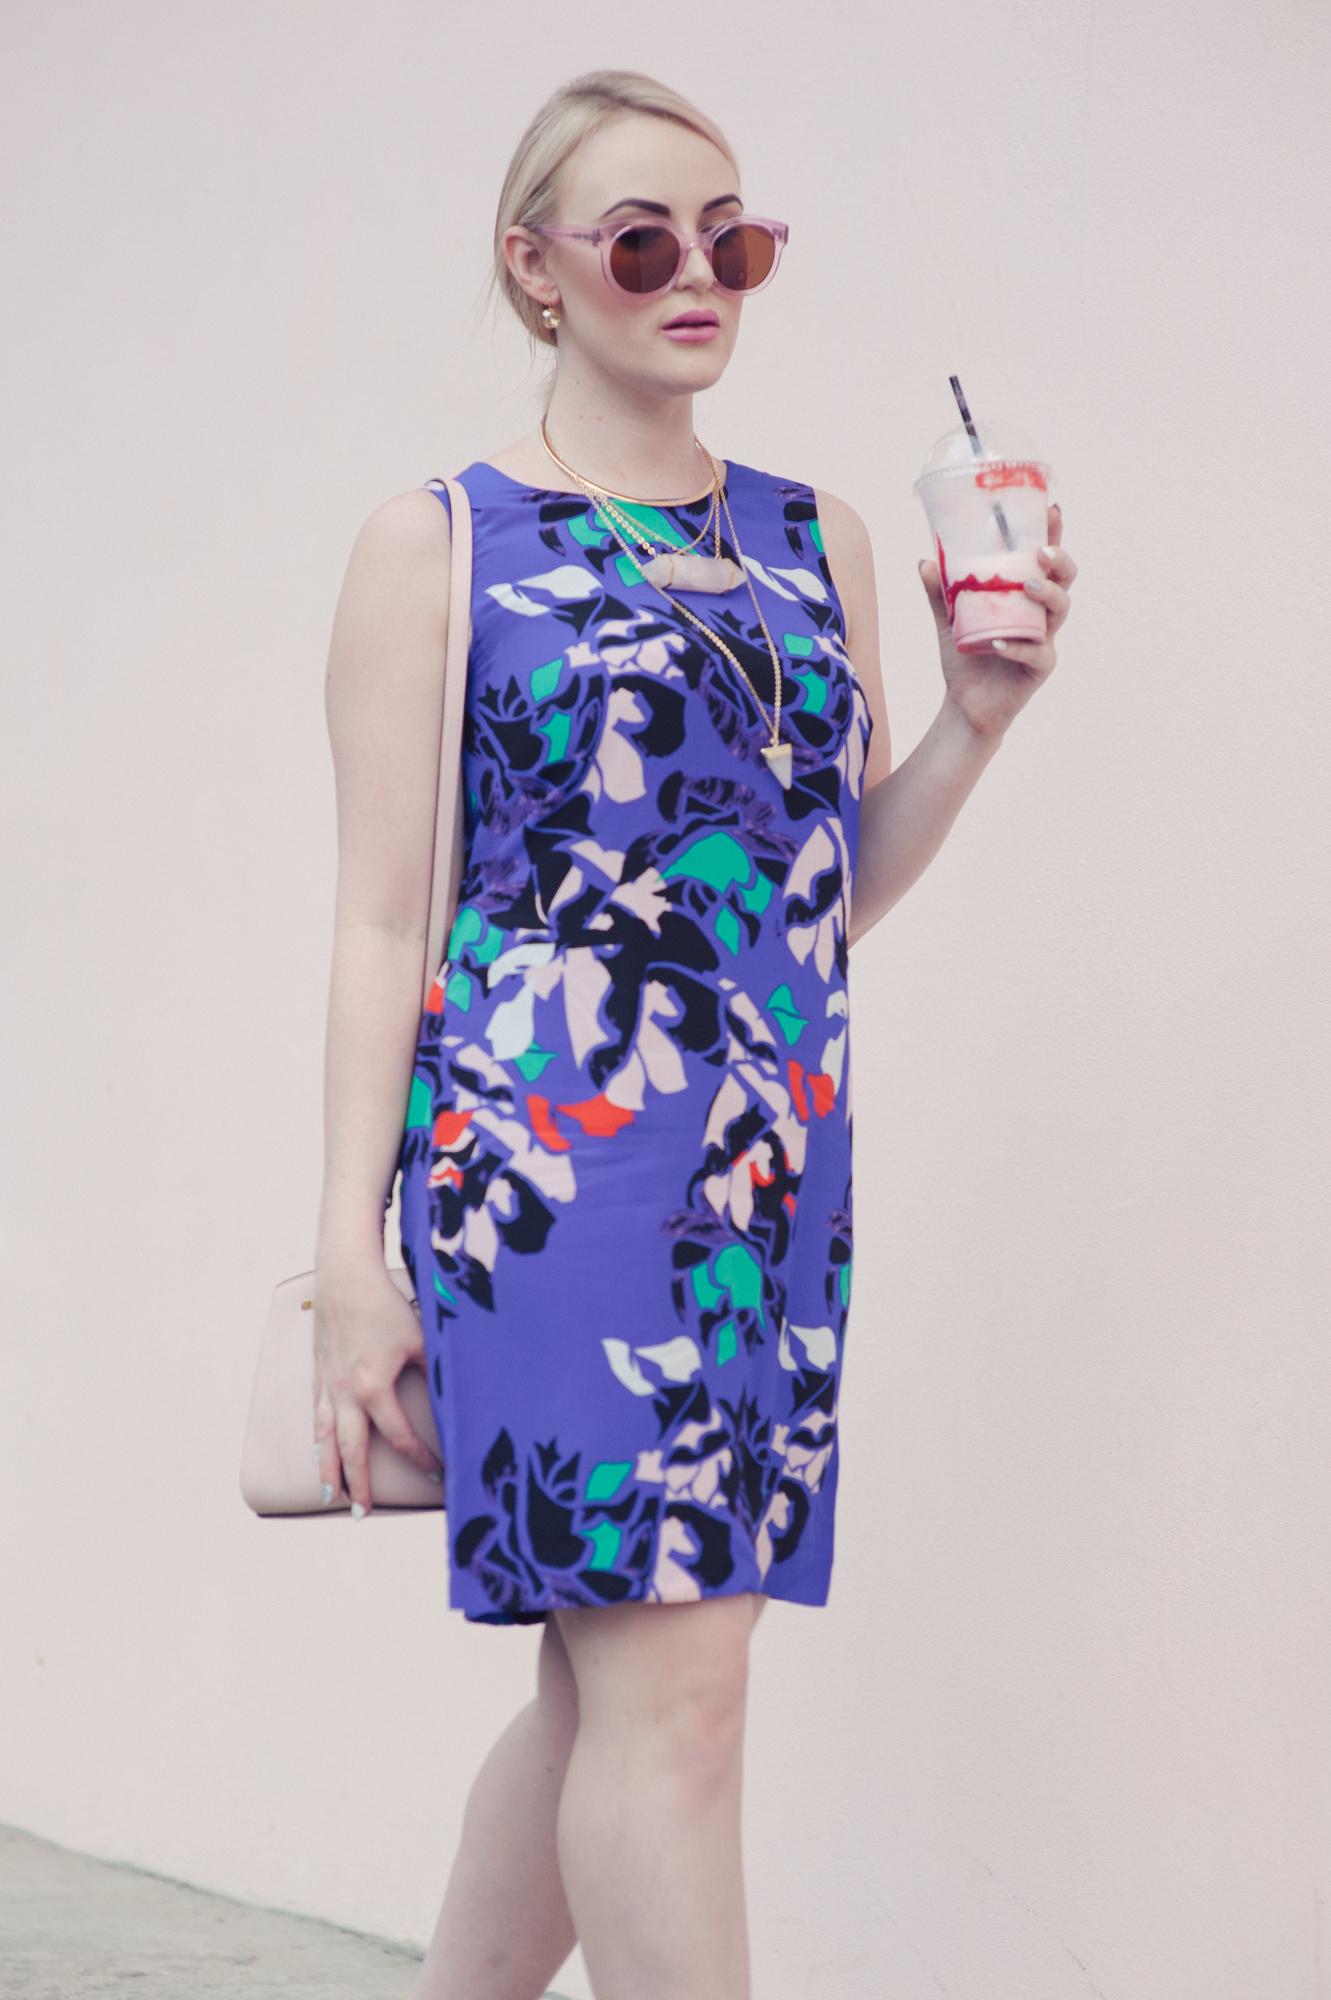 alt='Marcs Ladies Clothing #MarcsStreetView'